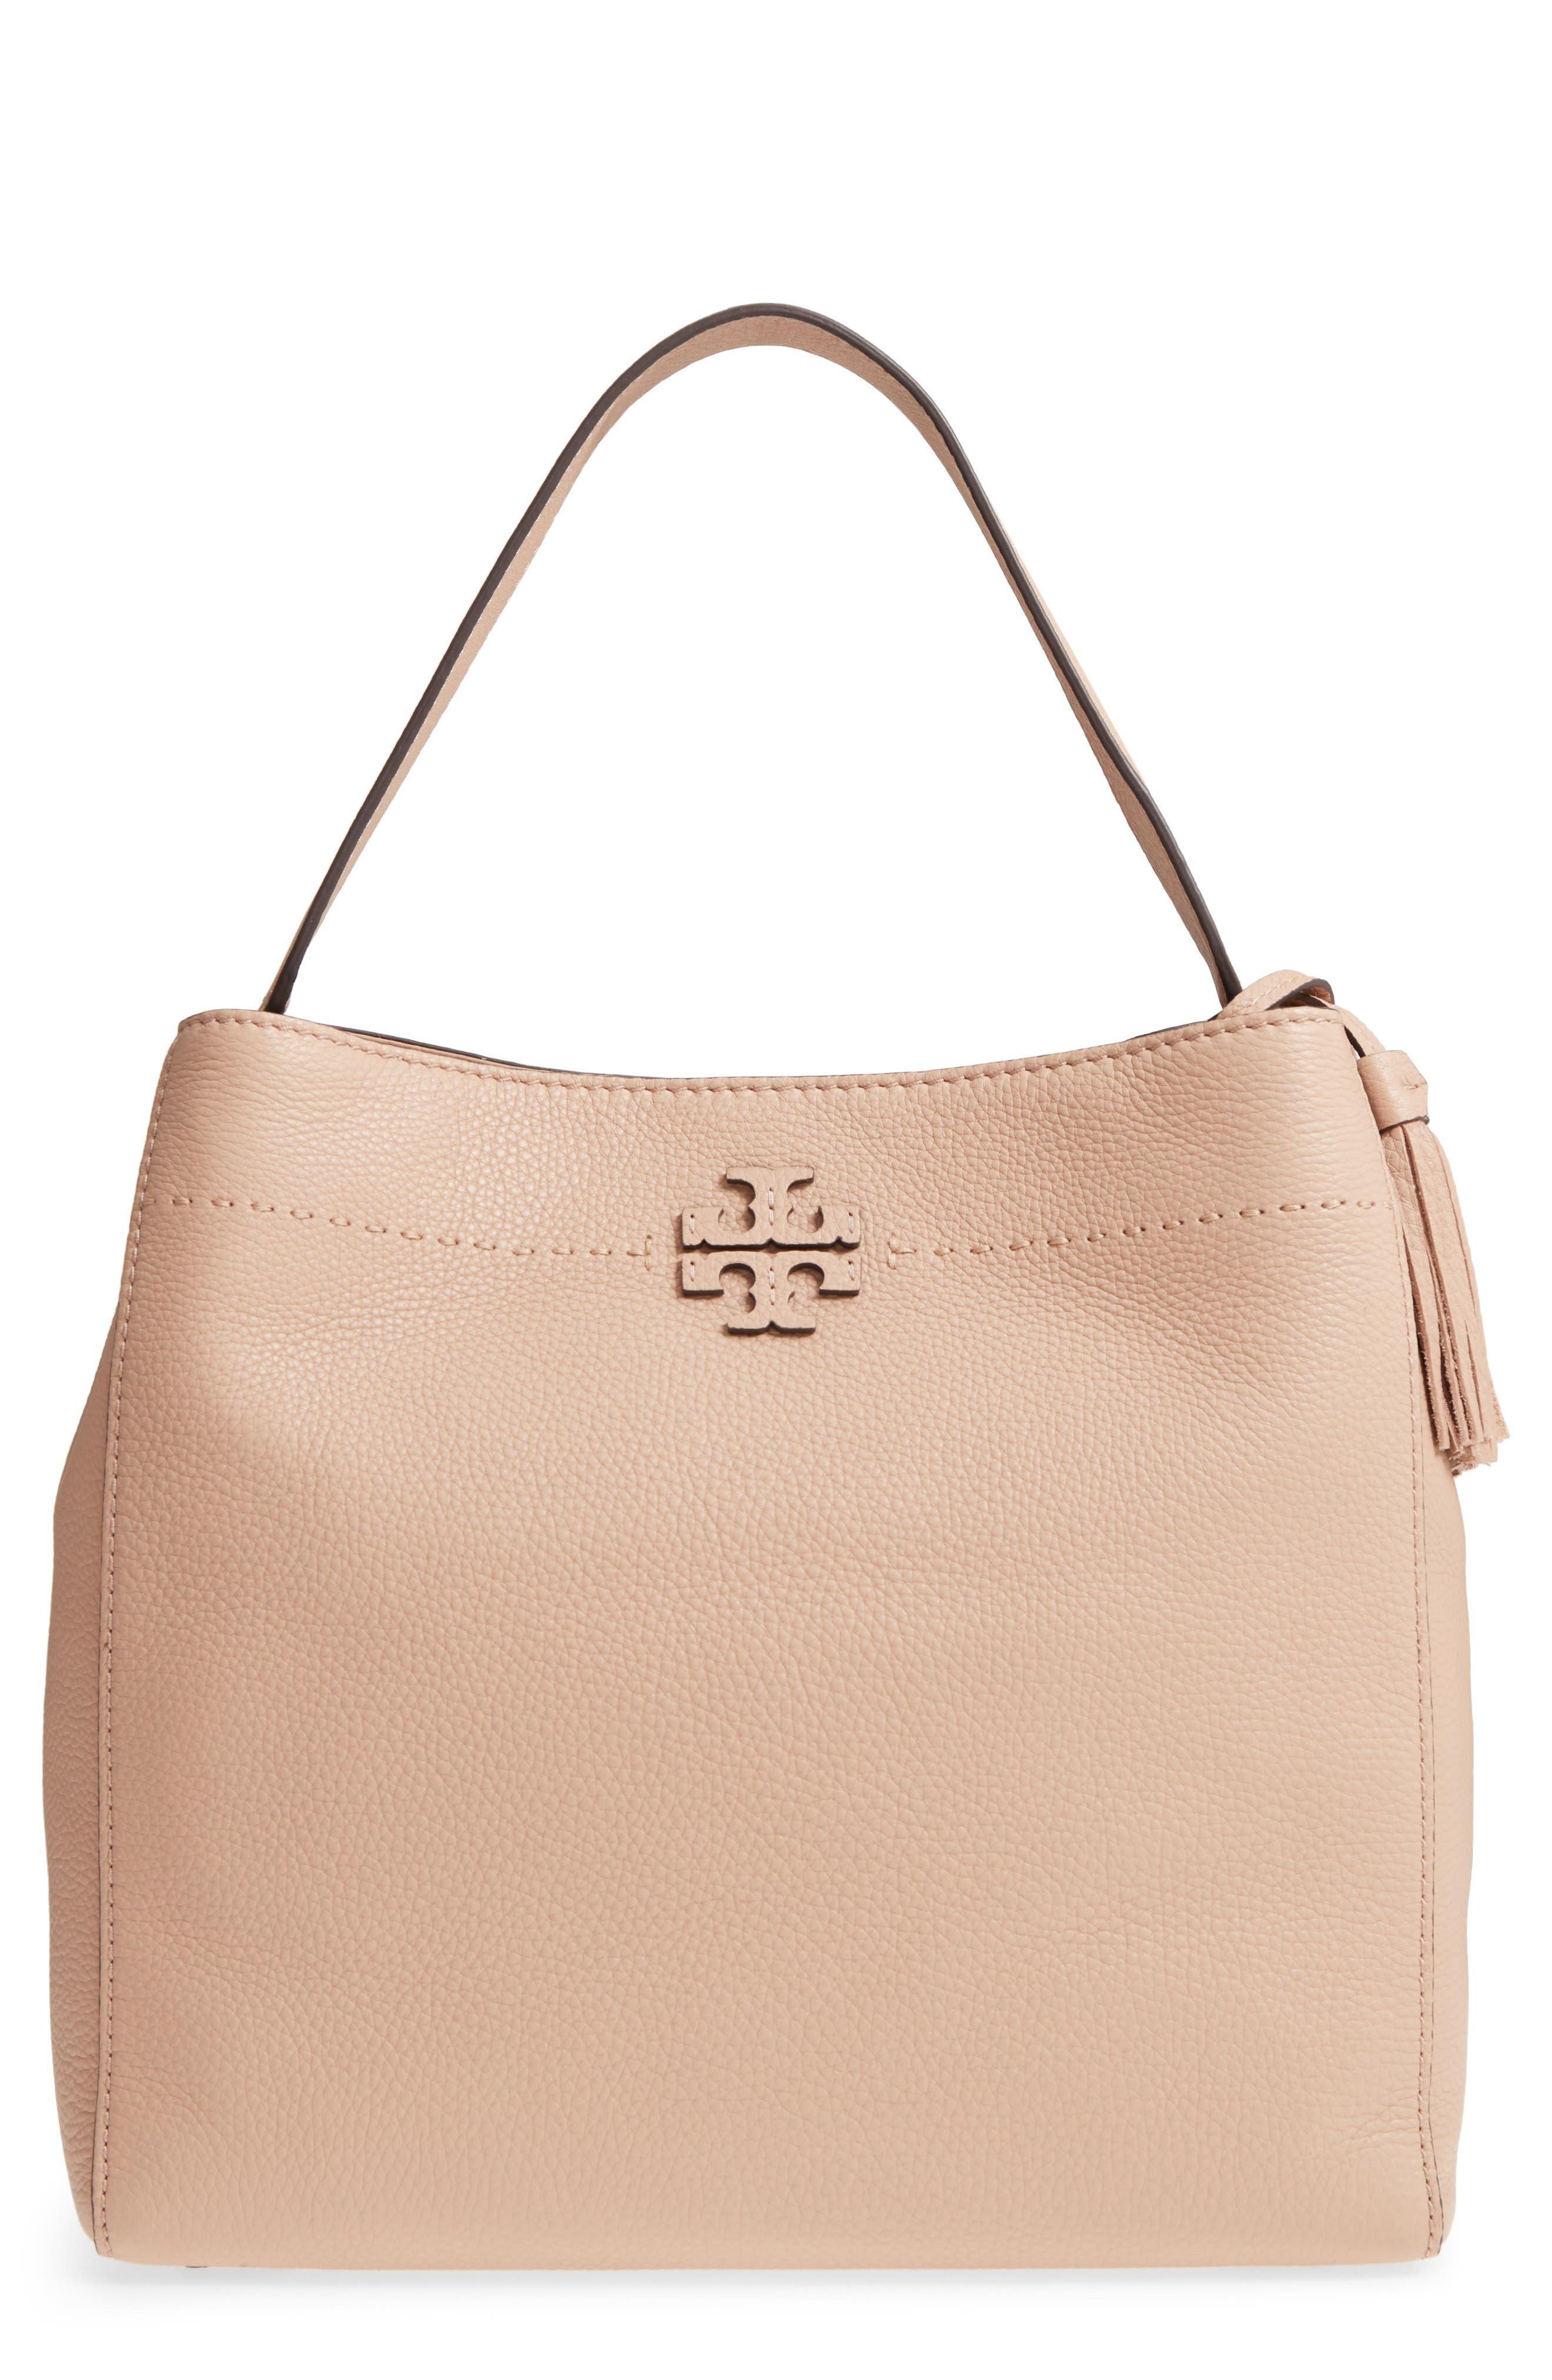 McGraw Leather Hobo,                         Main,                         color, DEVON SAND